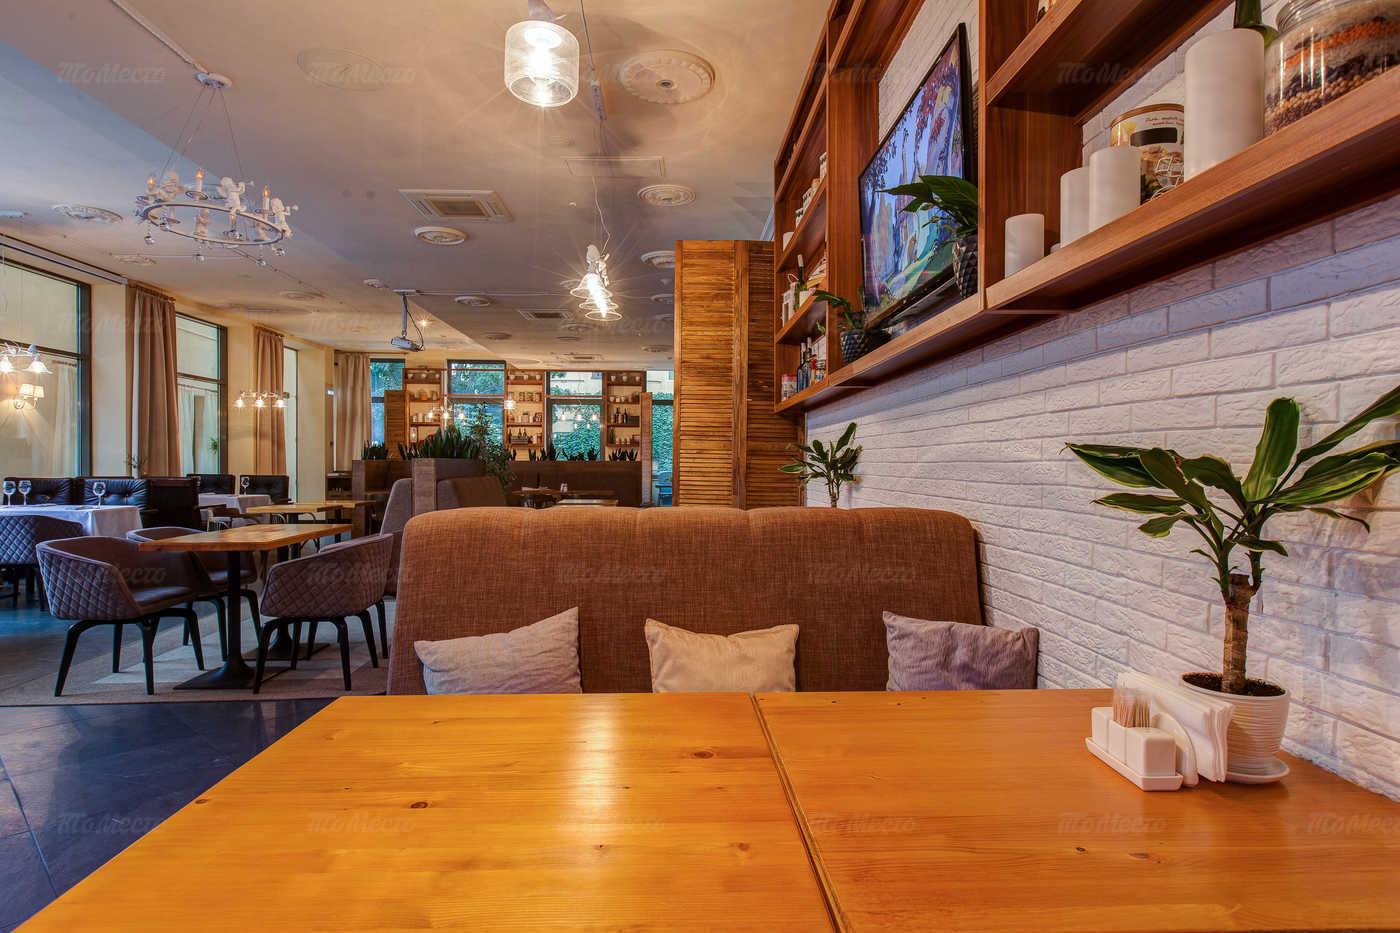 Меню ресторана Piccolo на Малом проспекте П.С.